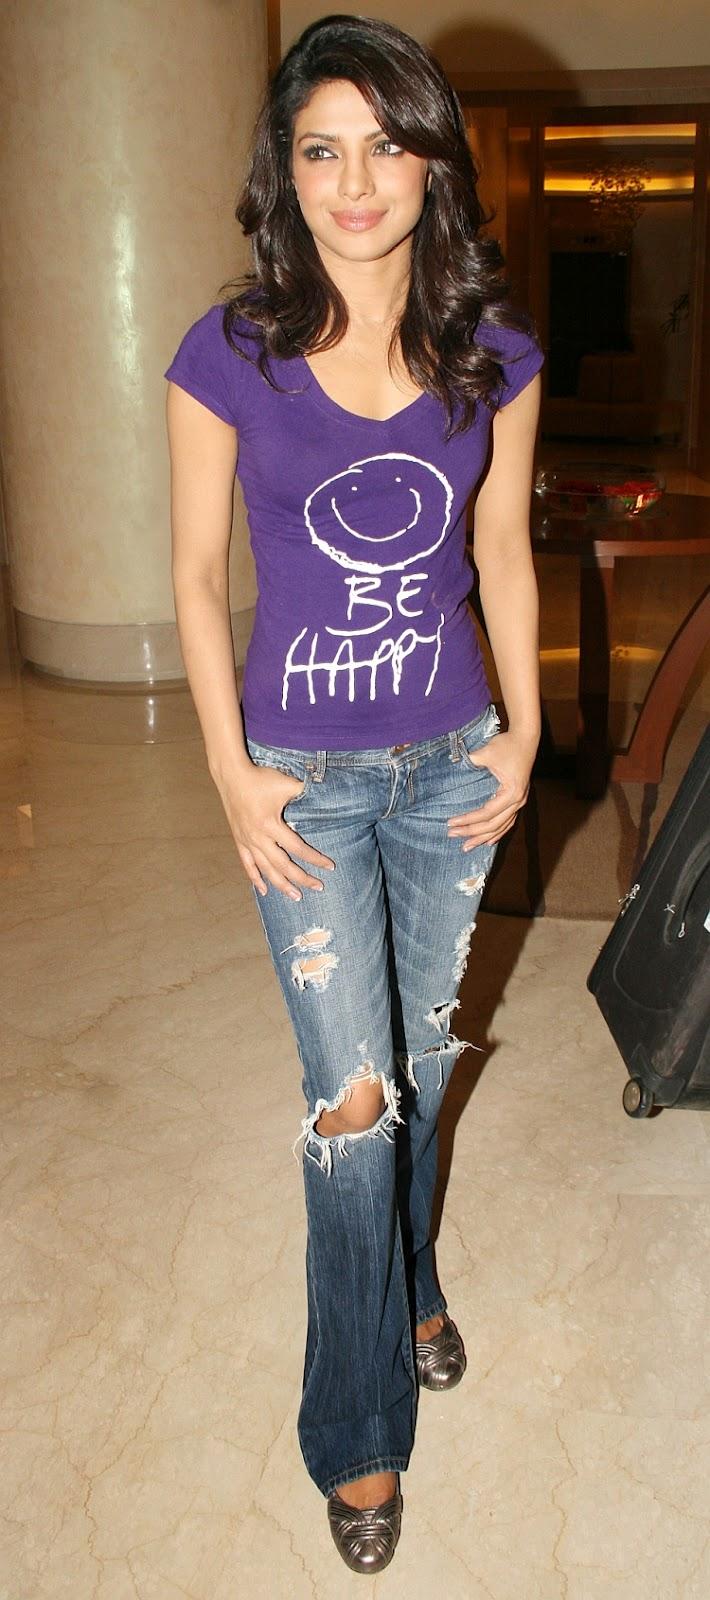 Indian Celebs Pics: Priyanka Chopra in Maxim